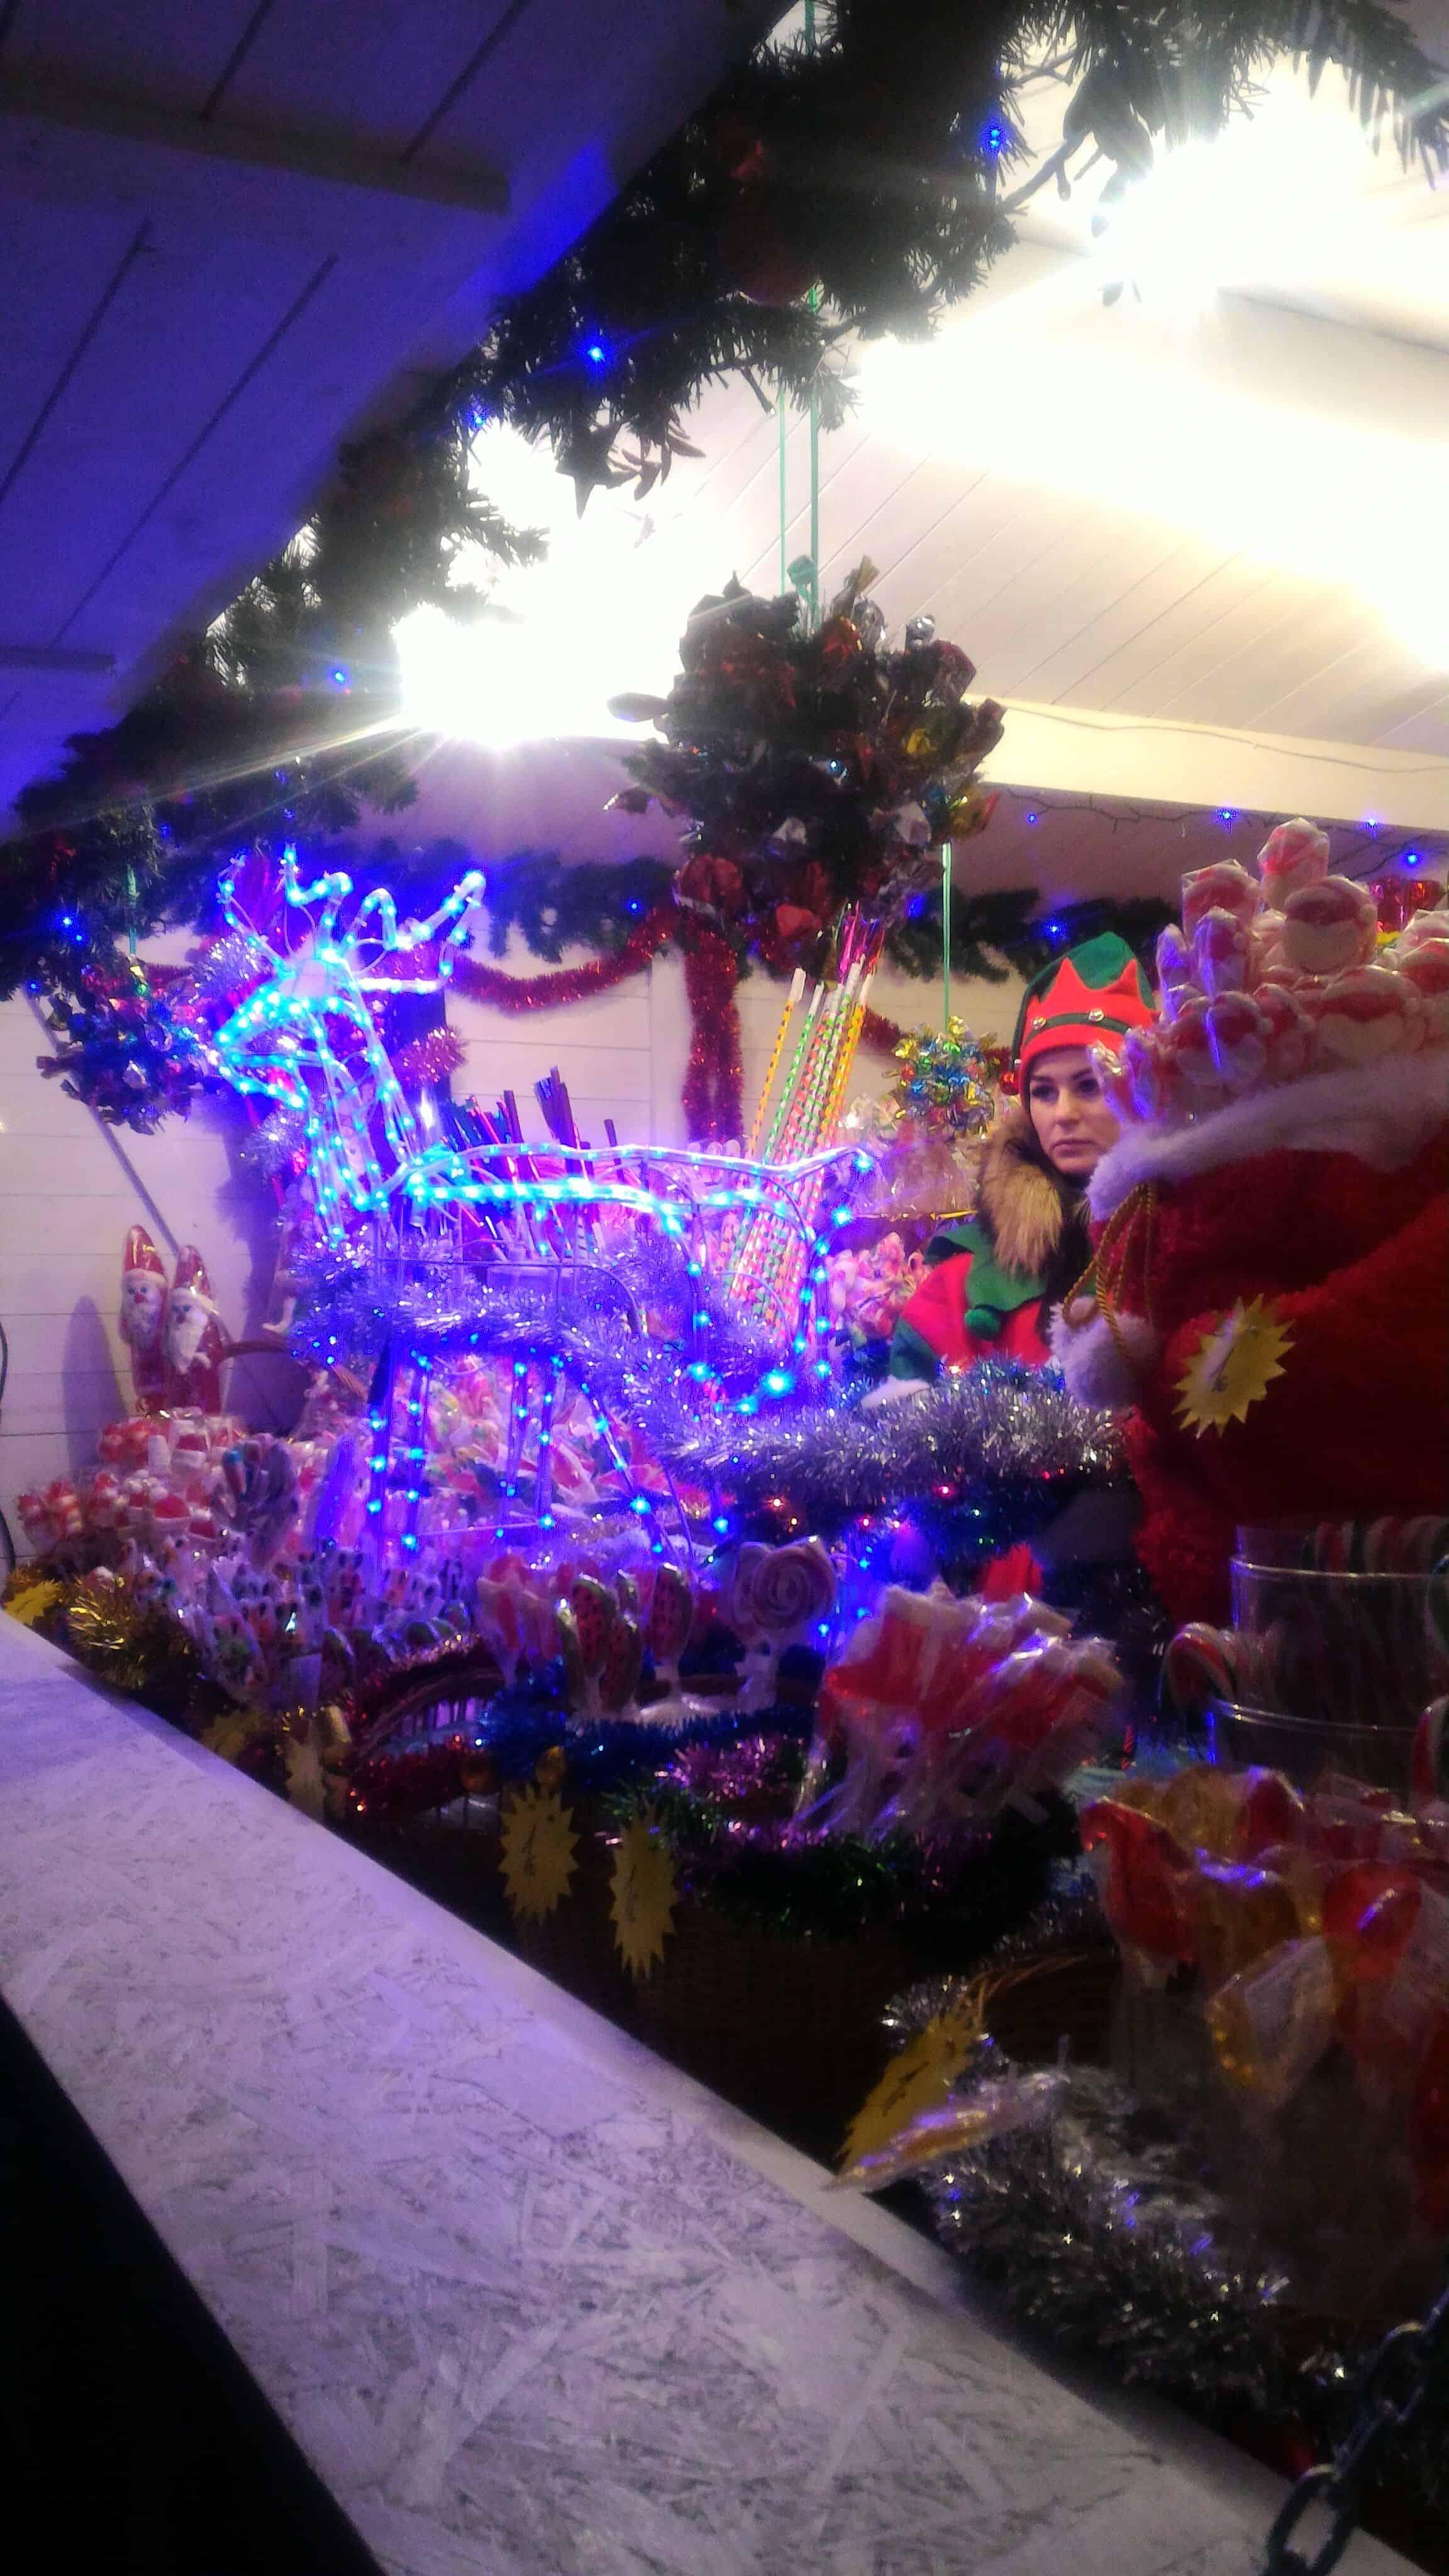 Kaunas Noel Pazarı, Litvanya